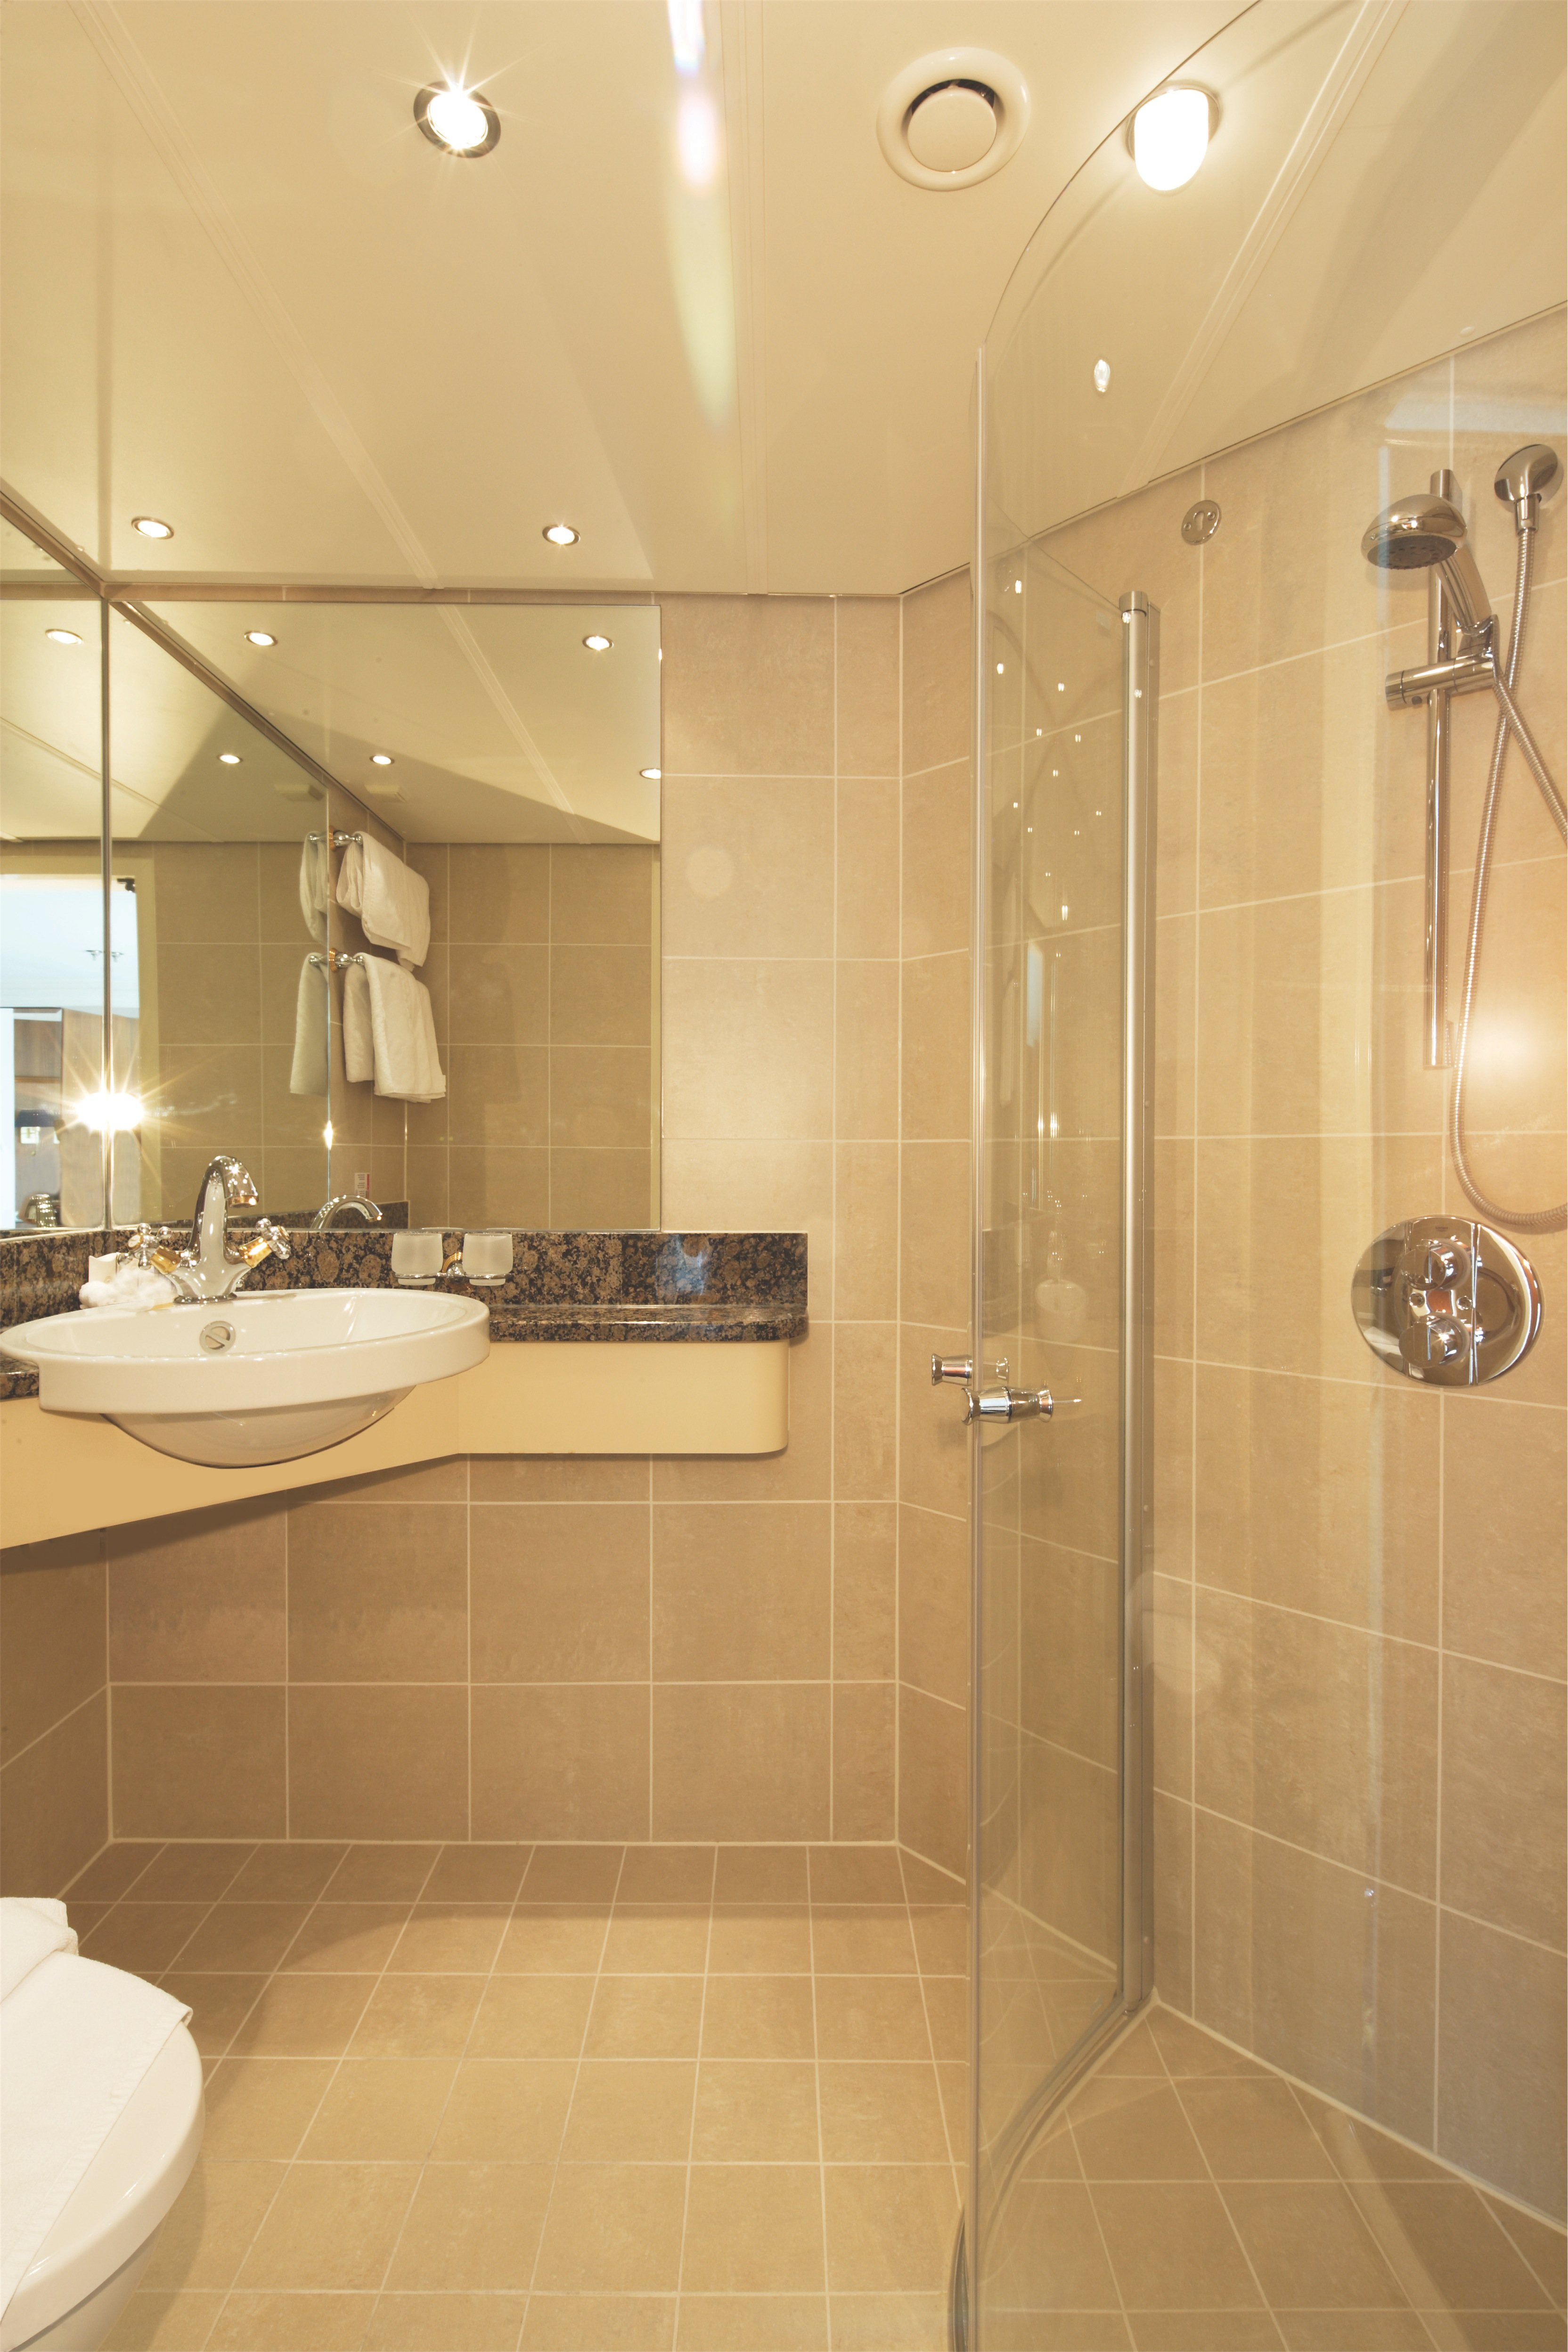 Riviera Travel MS Jane Austen & MS Lord Byron Accommodation Bathroom.jpg